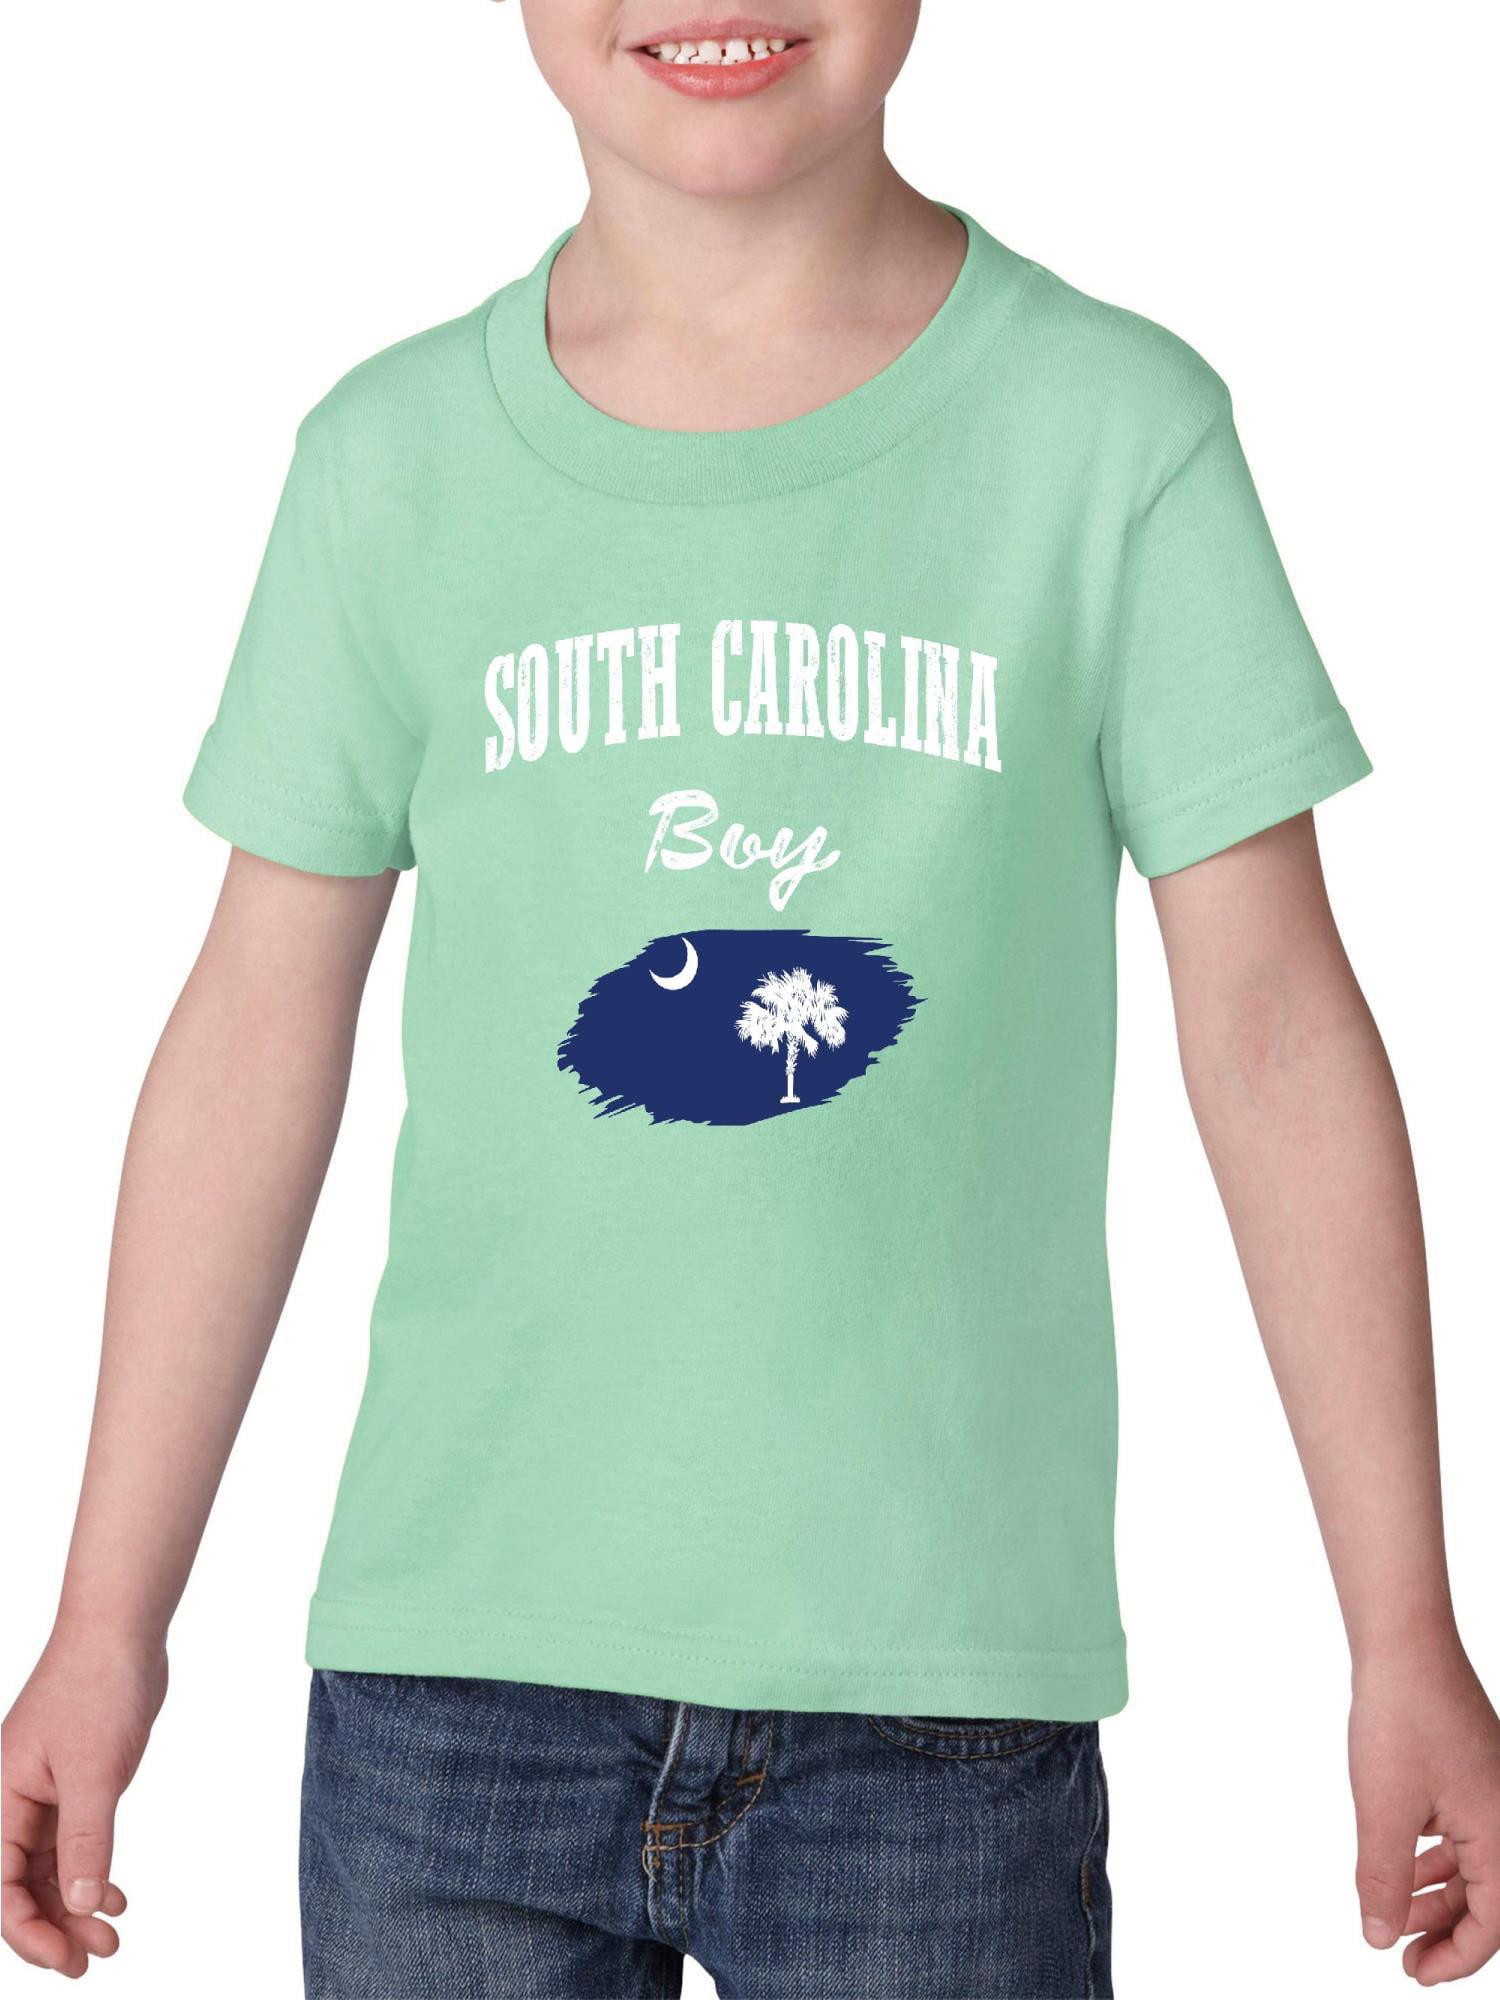 South Carolina Boy Heavy Cotton Toddler Kids T-Shirt Tee Clothing